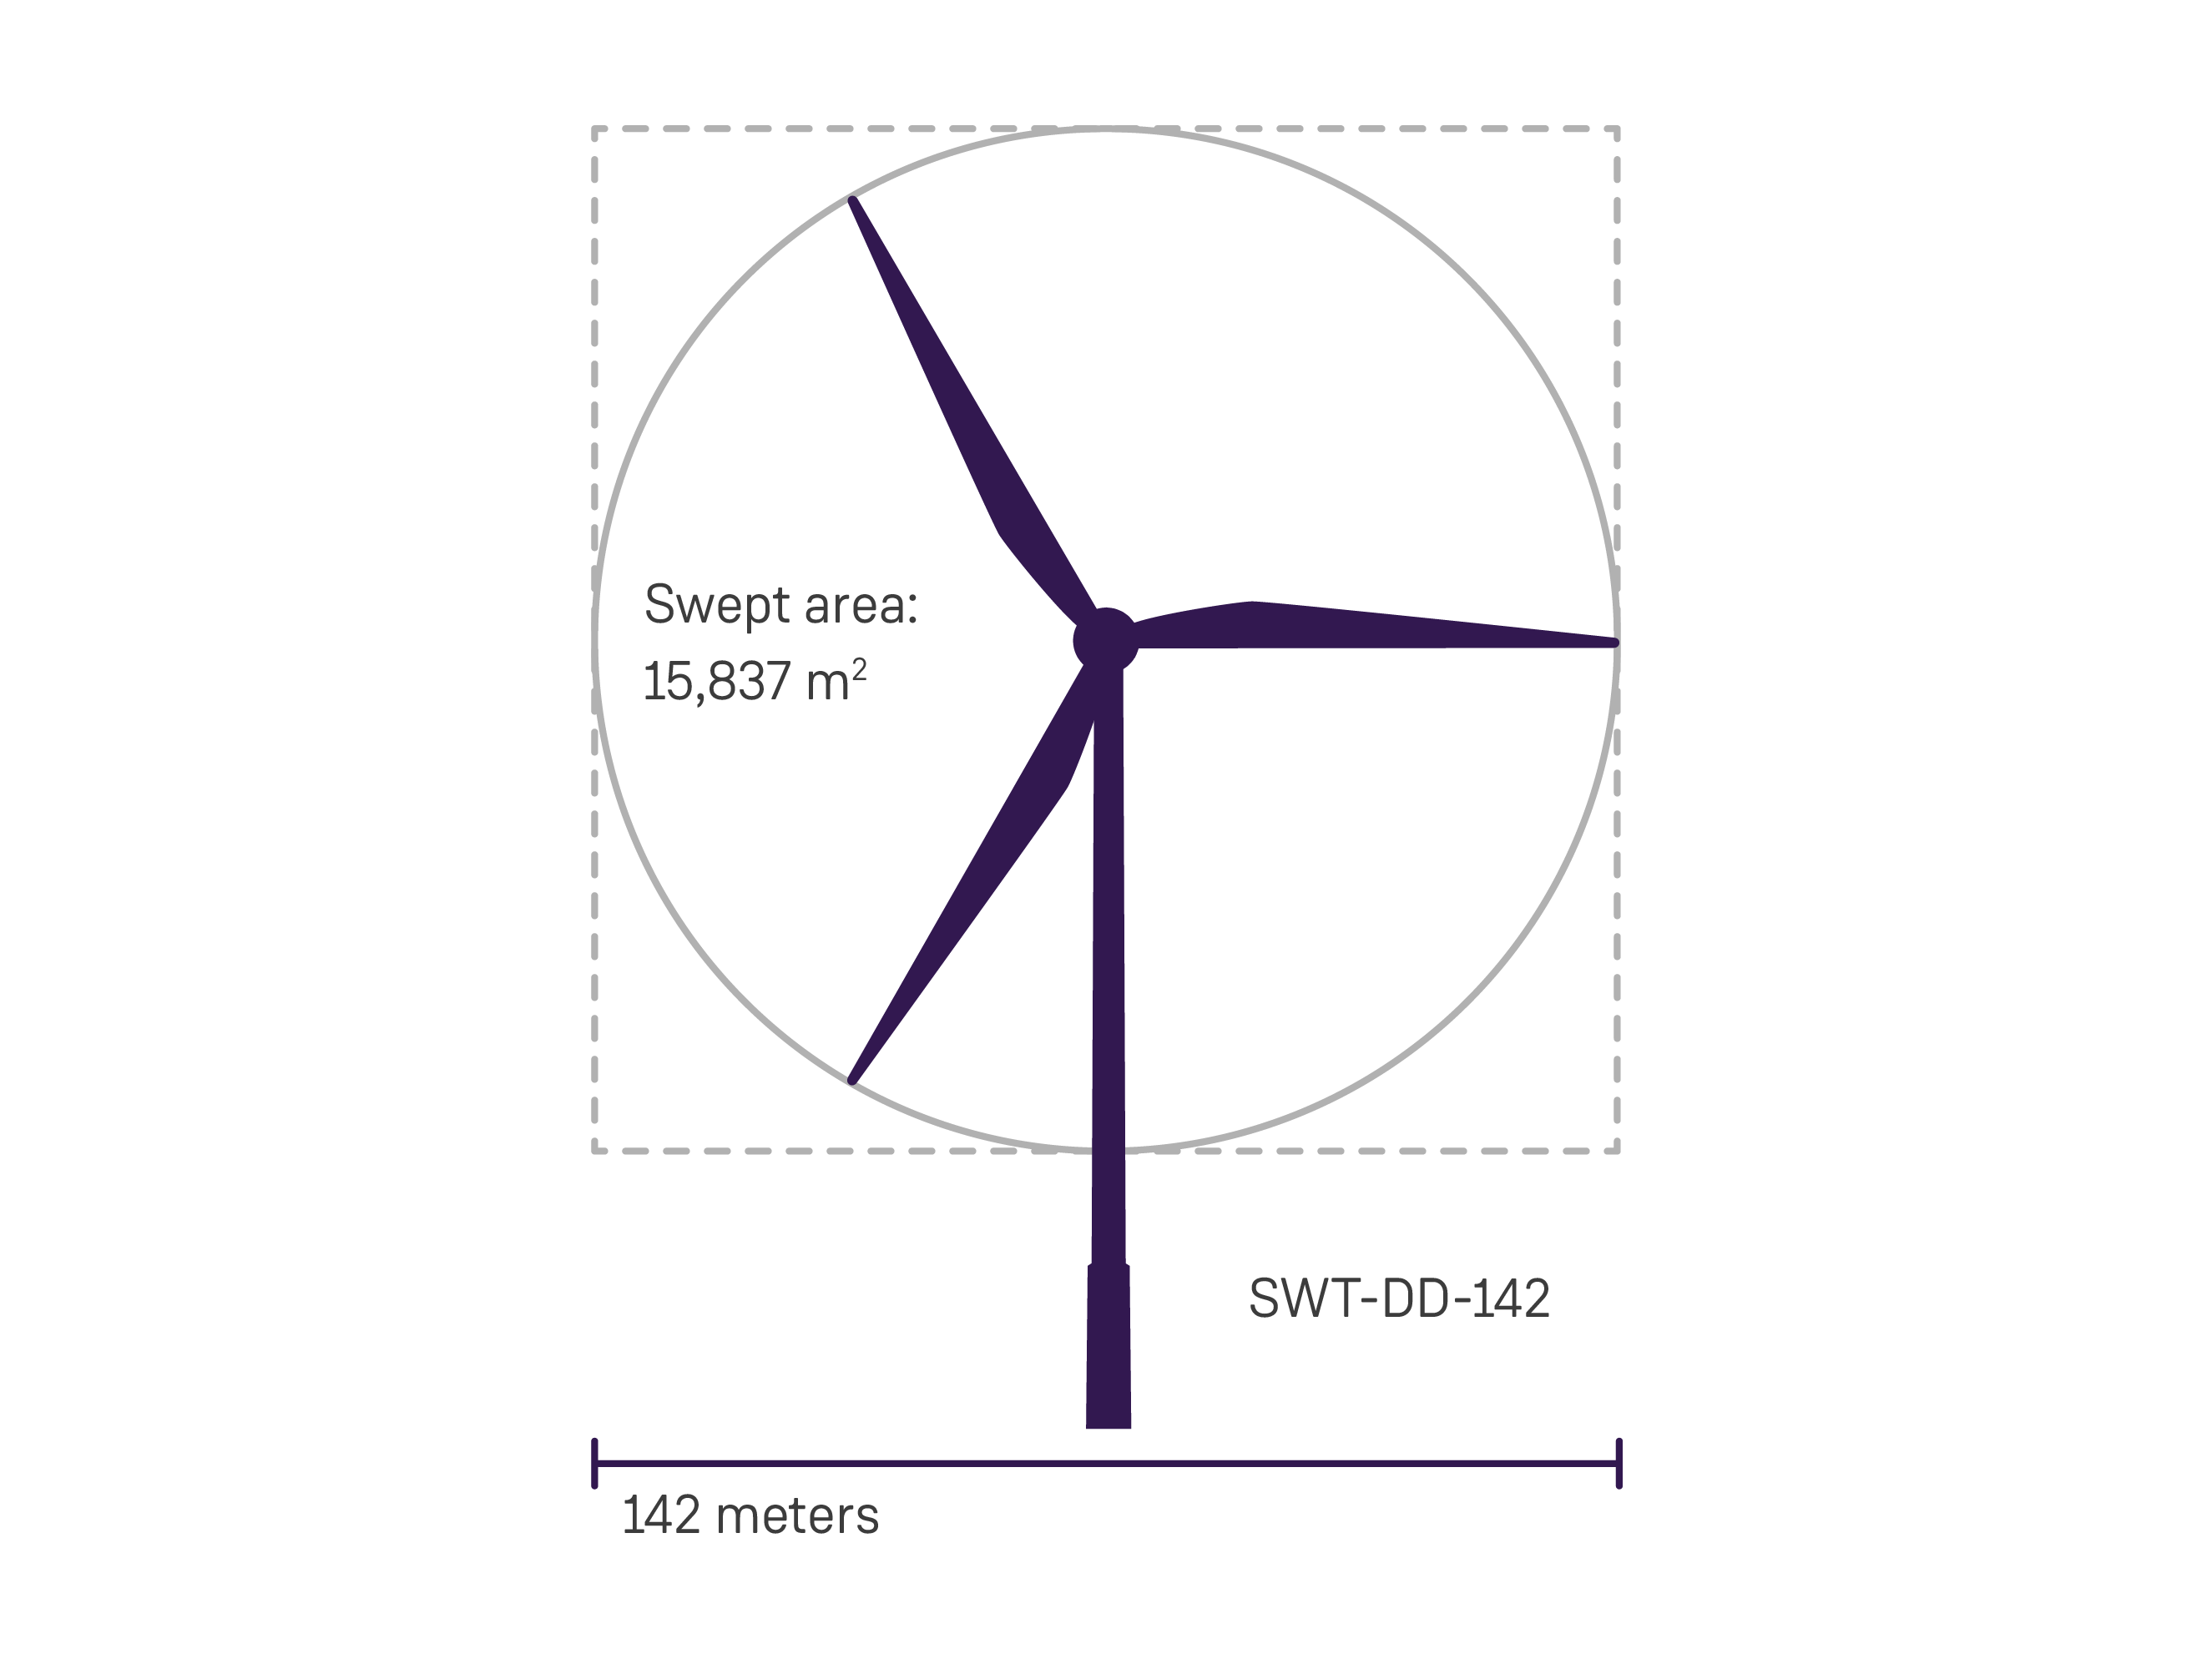 siemens gamesa onshore wind turbine swt